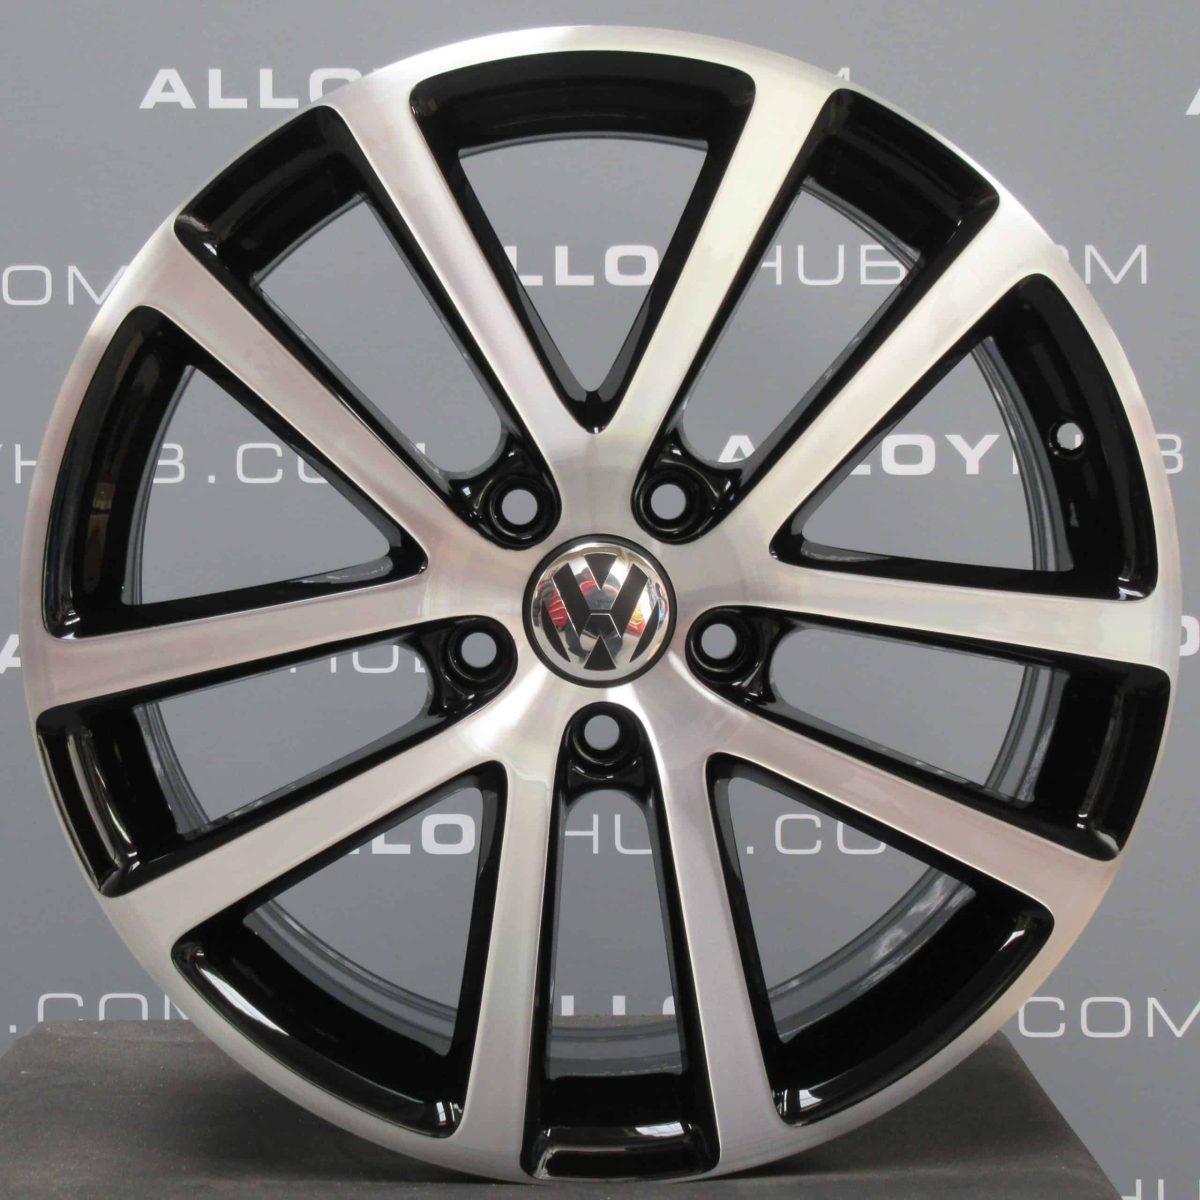 "Genuine Volkswagen Golf MK6 Charleston 5 Twin Spoke 18"" inch Alloy Wheels with Gloss Black & Diamond Turned Finish 1K0 601 025 AG"